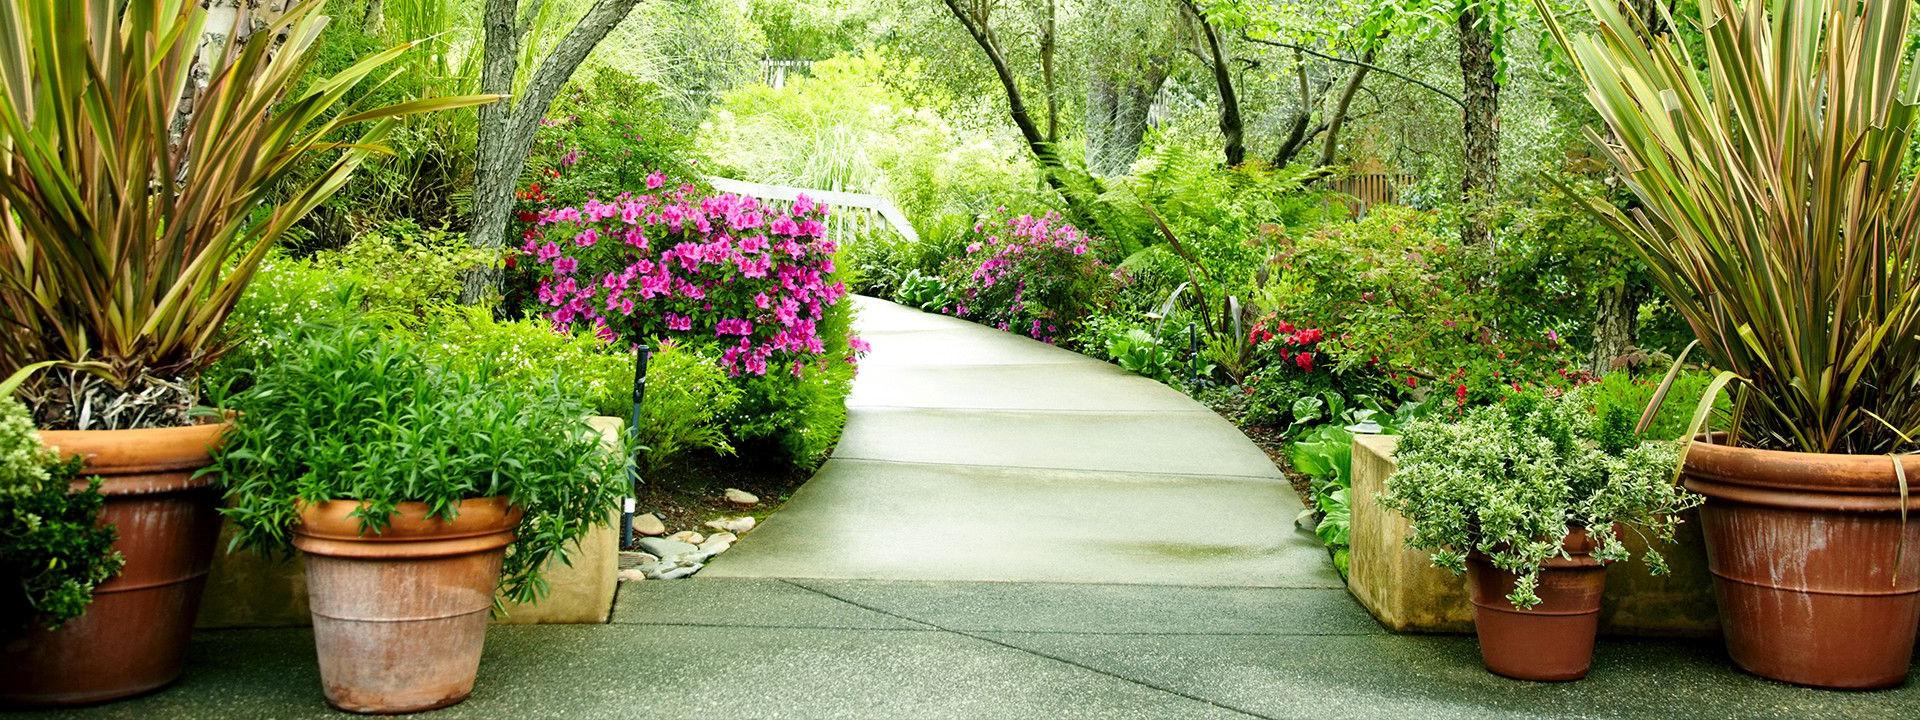 Resources | Woodridge Memorial Park